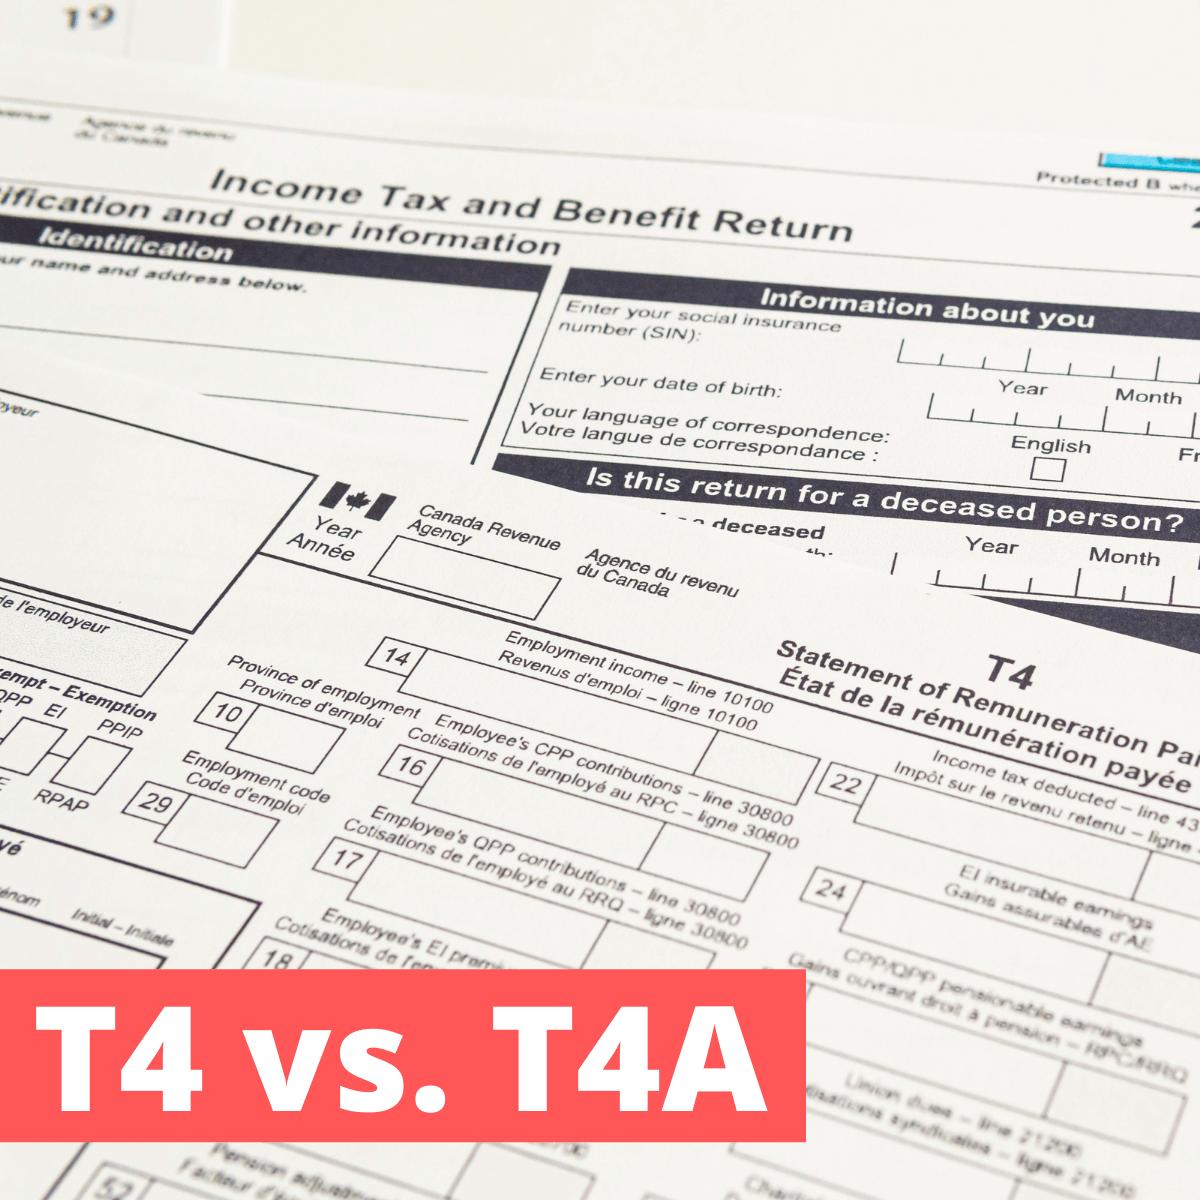 T4 vs. T4A